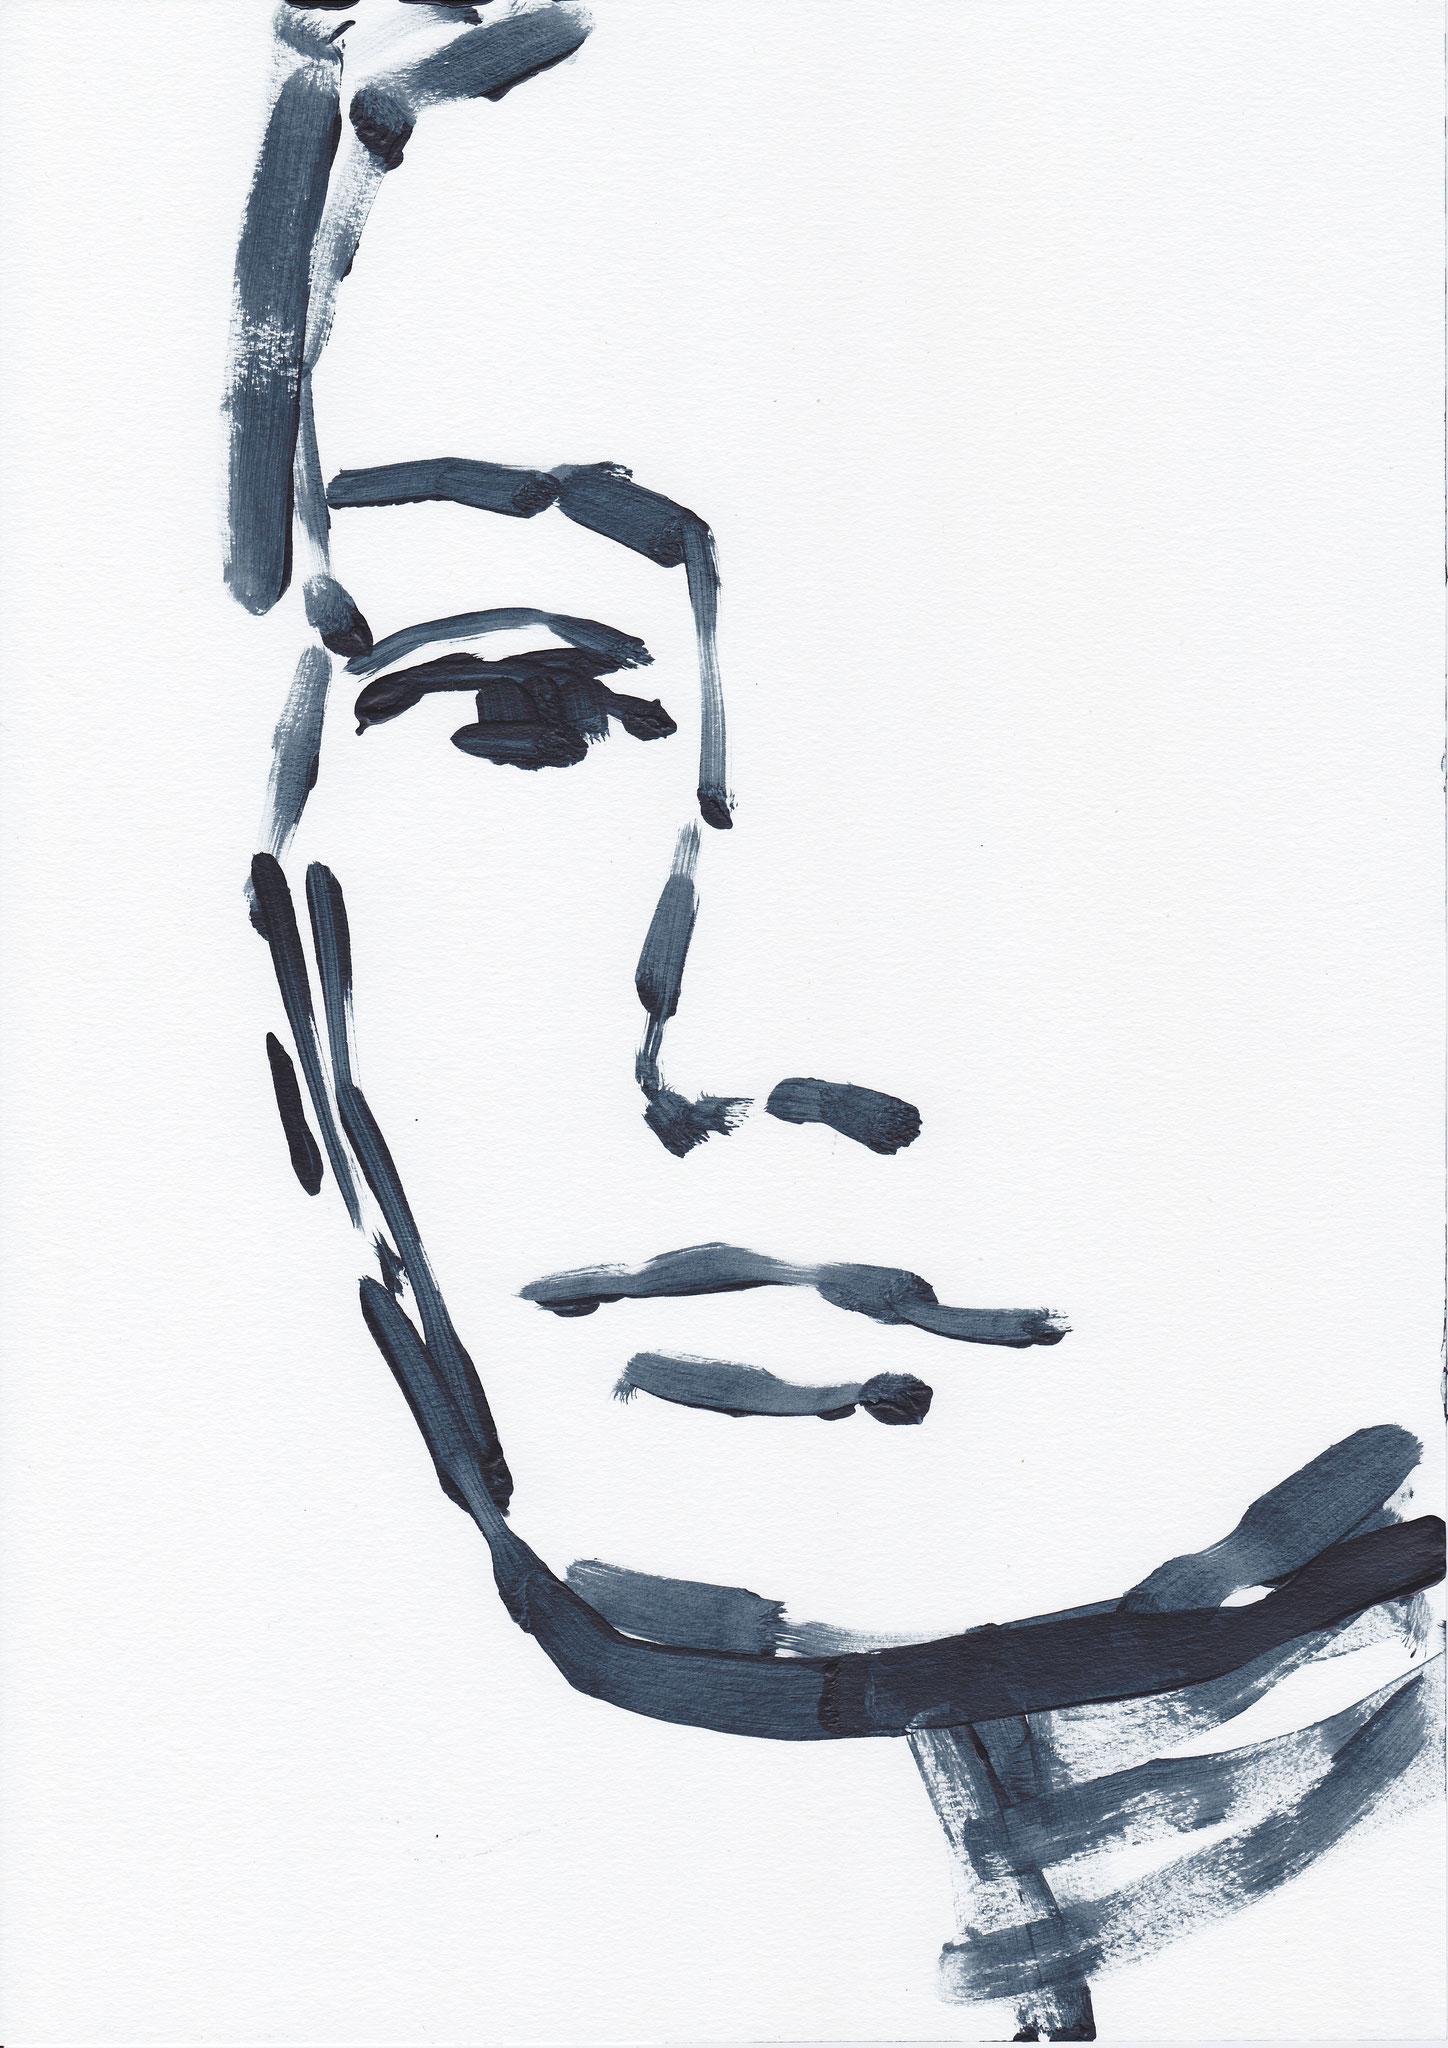 053 , acrylic on paper , 29.7 x 21cm , Selina Saranova